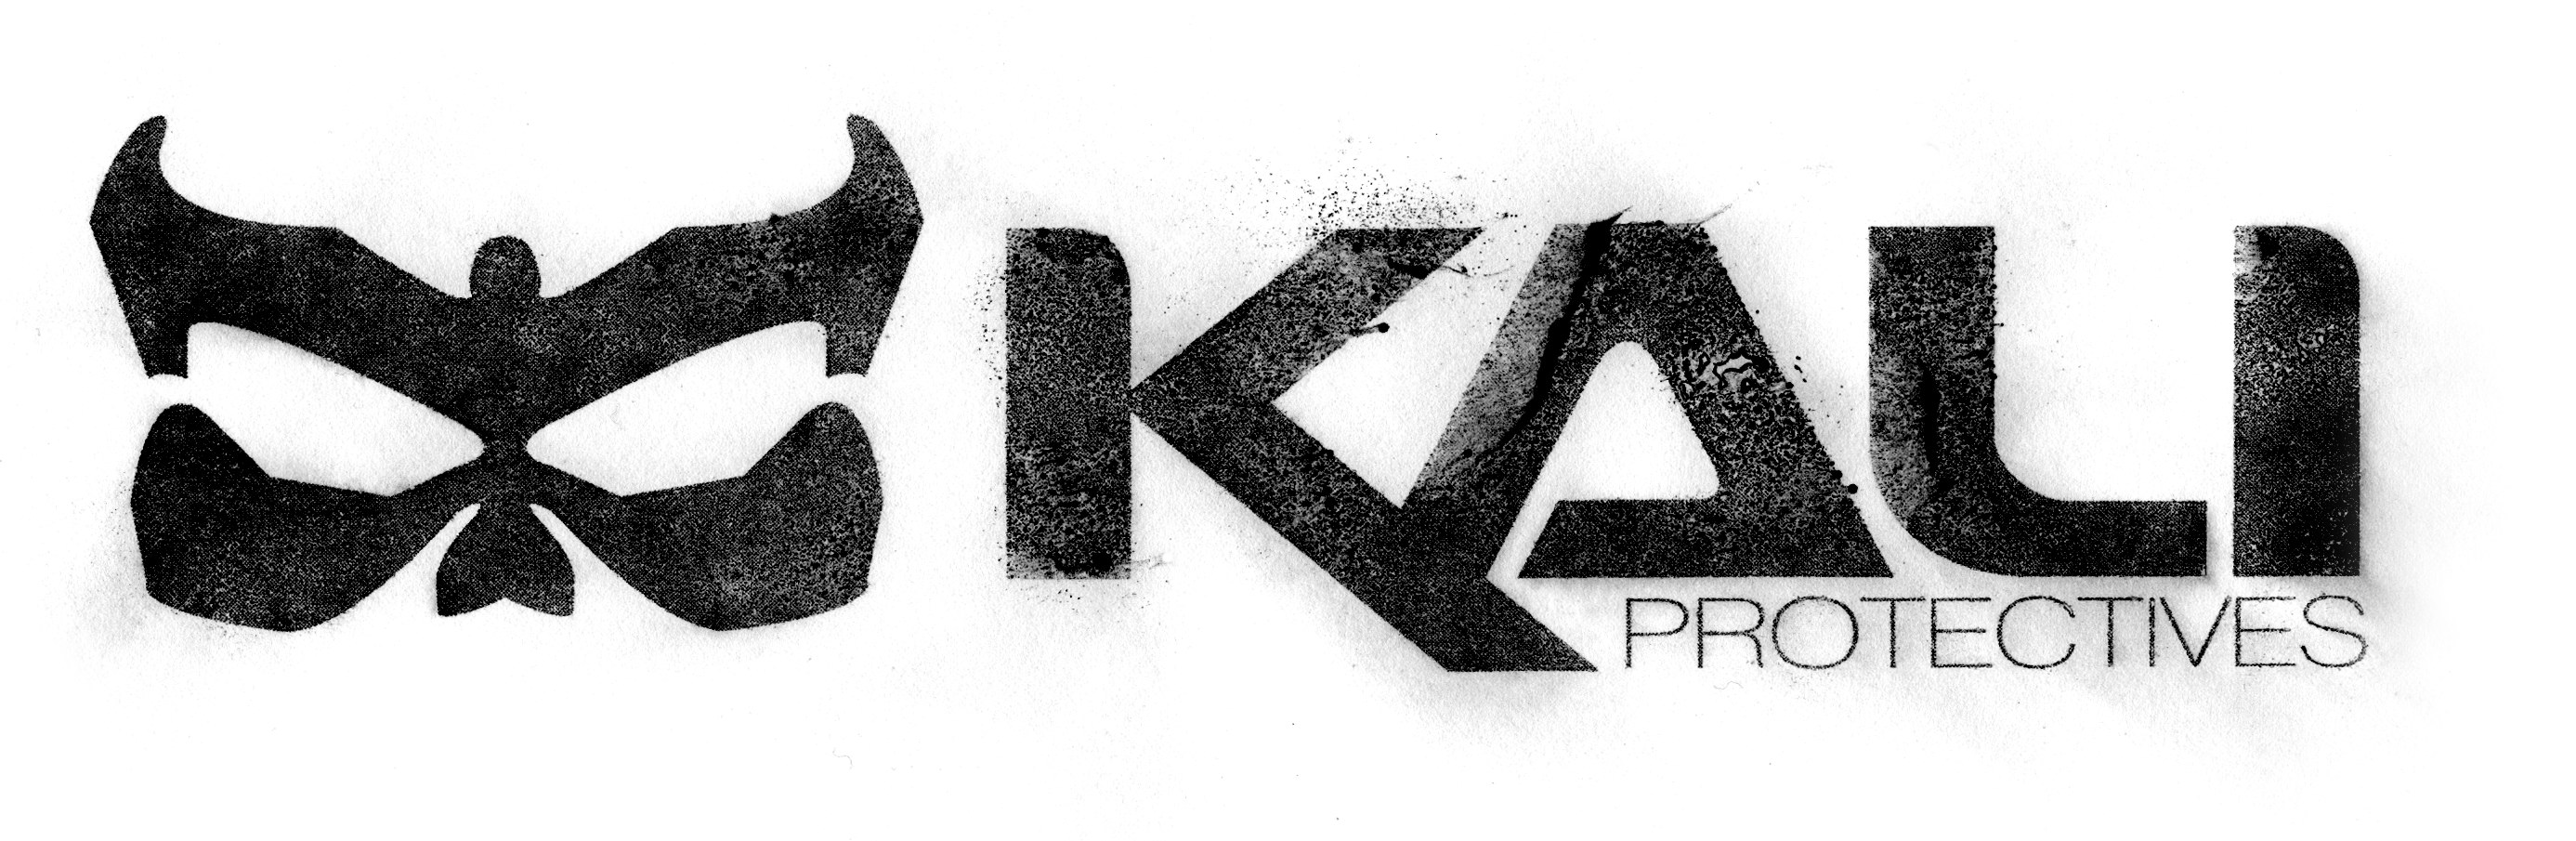 kali-logo-new